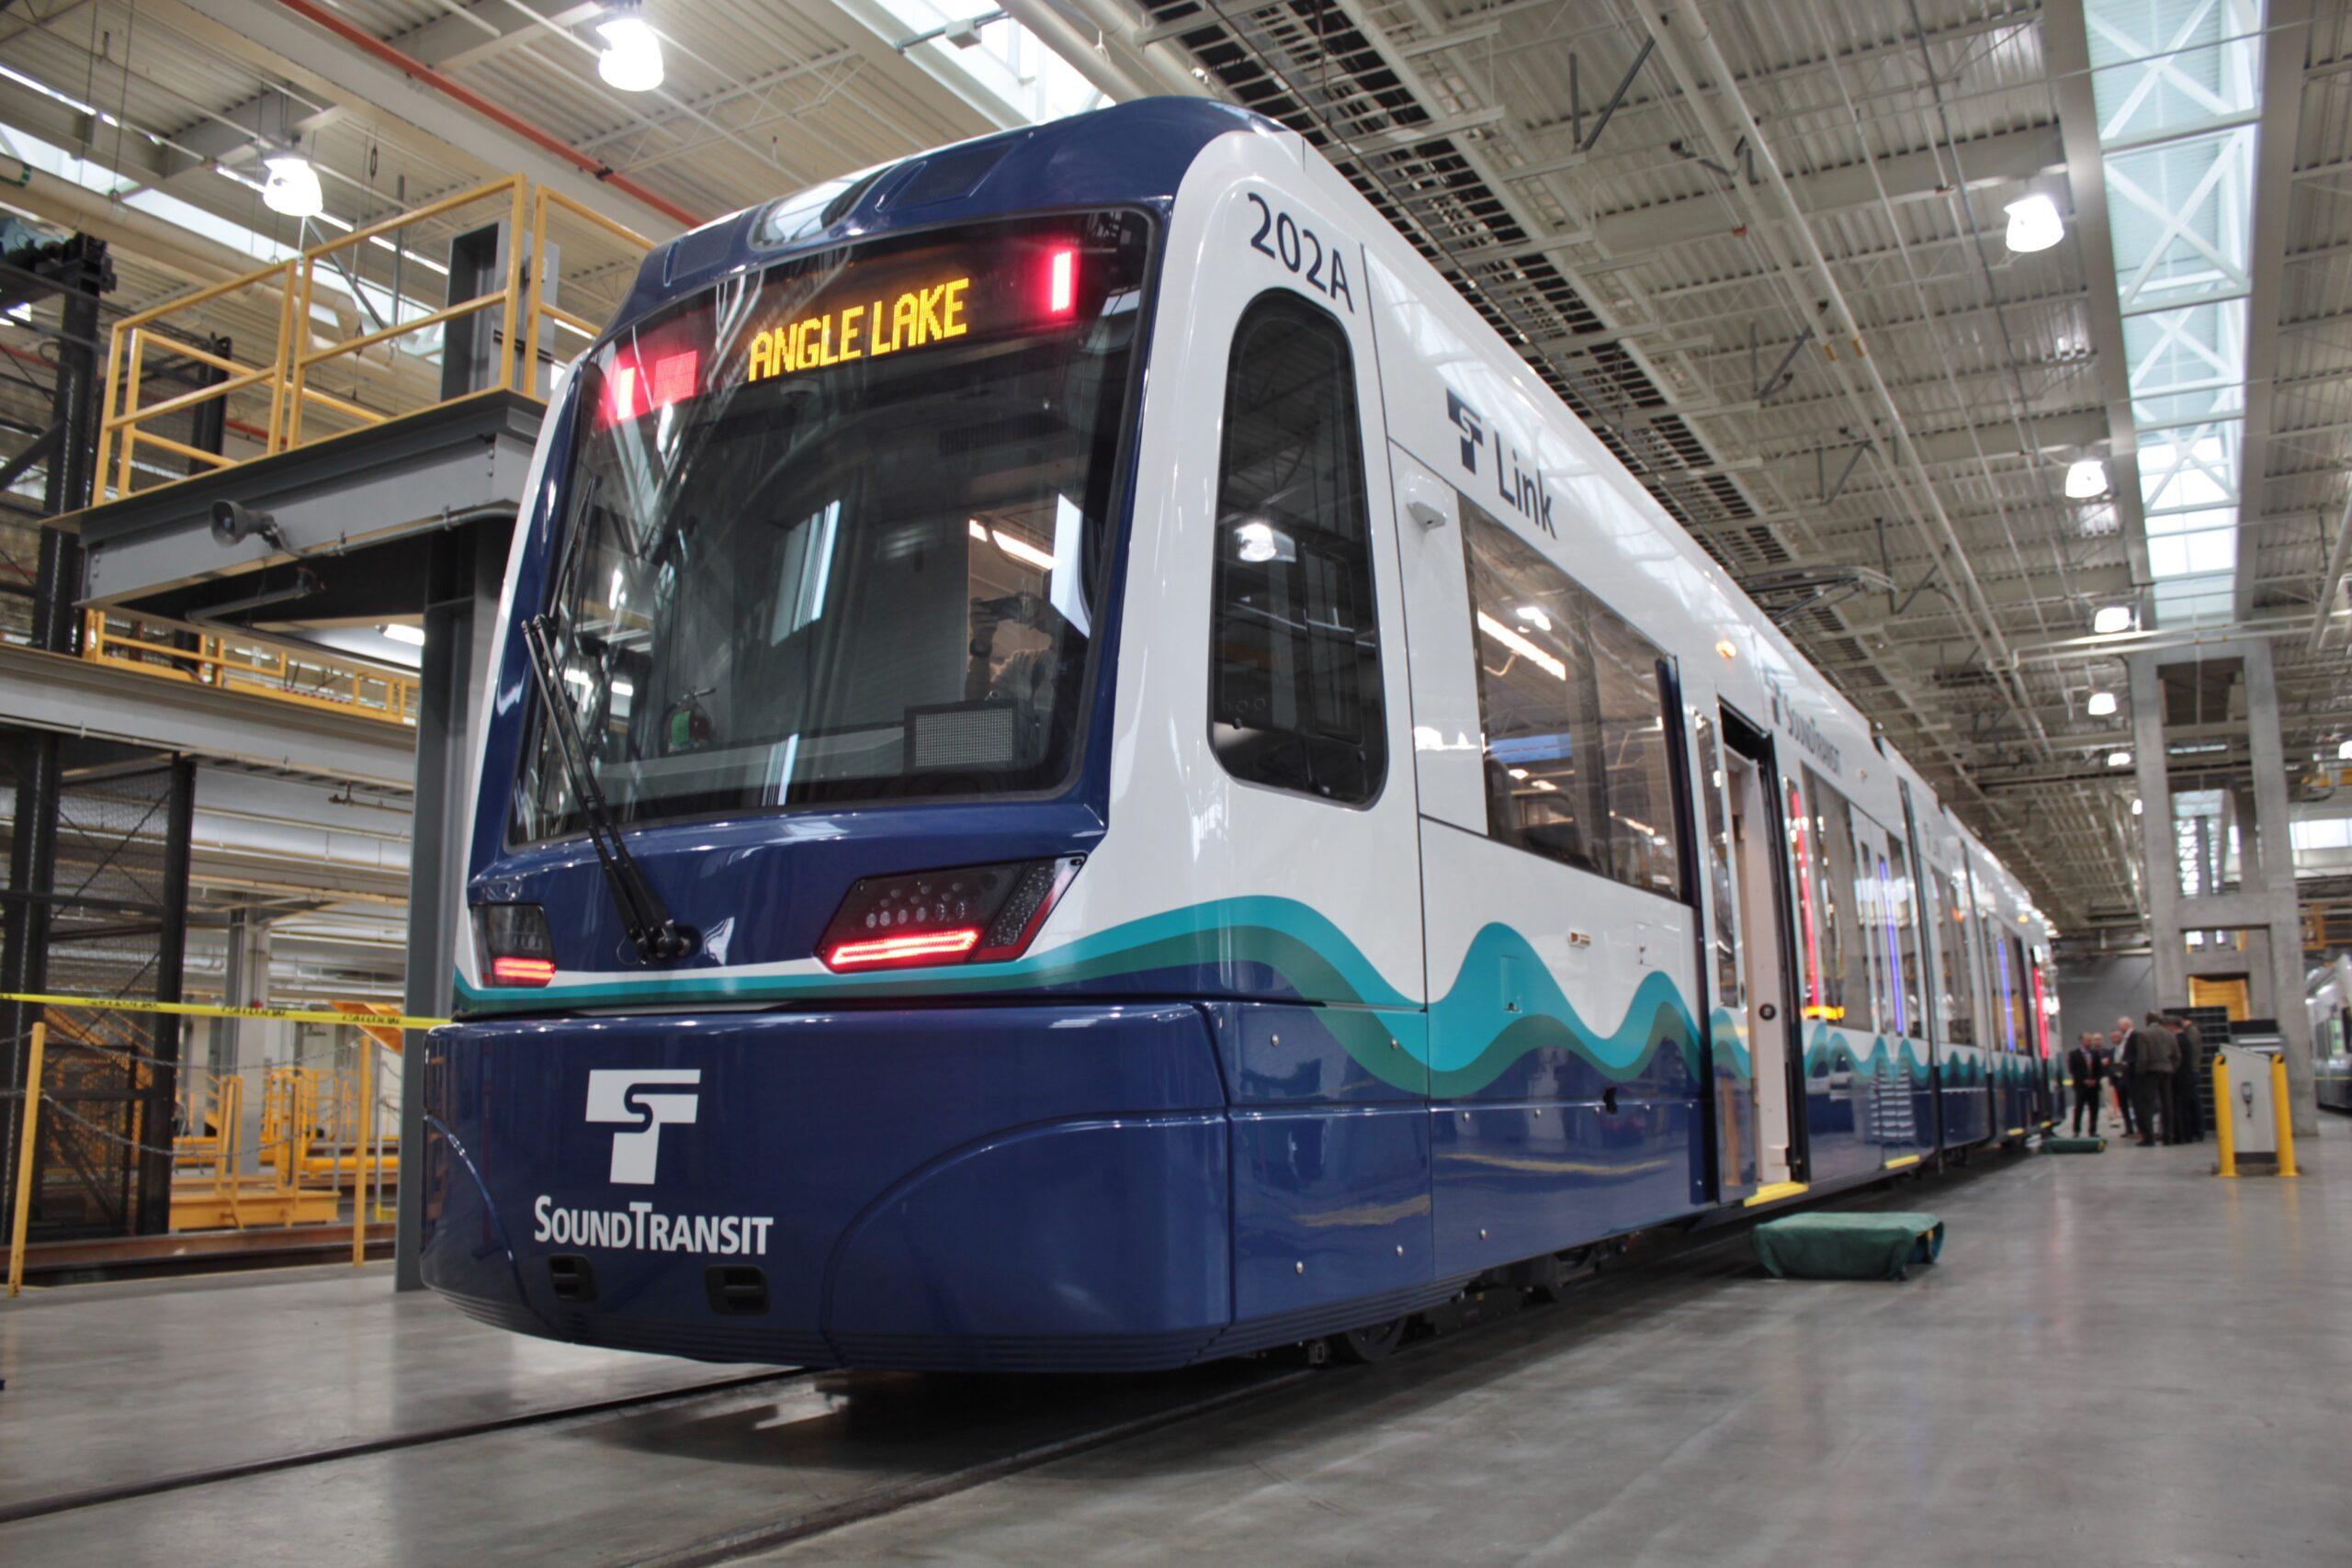 A Siemens S700 light rail vehicle for Sound Transit, Seattle